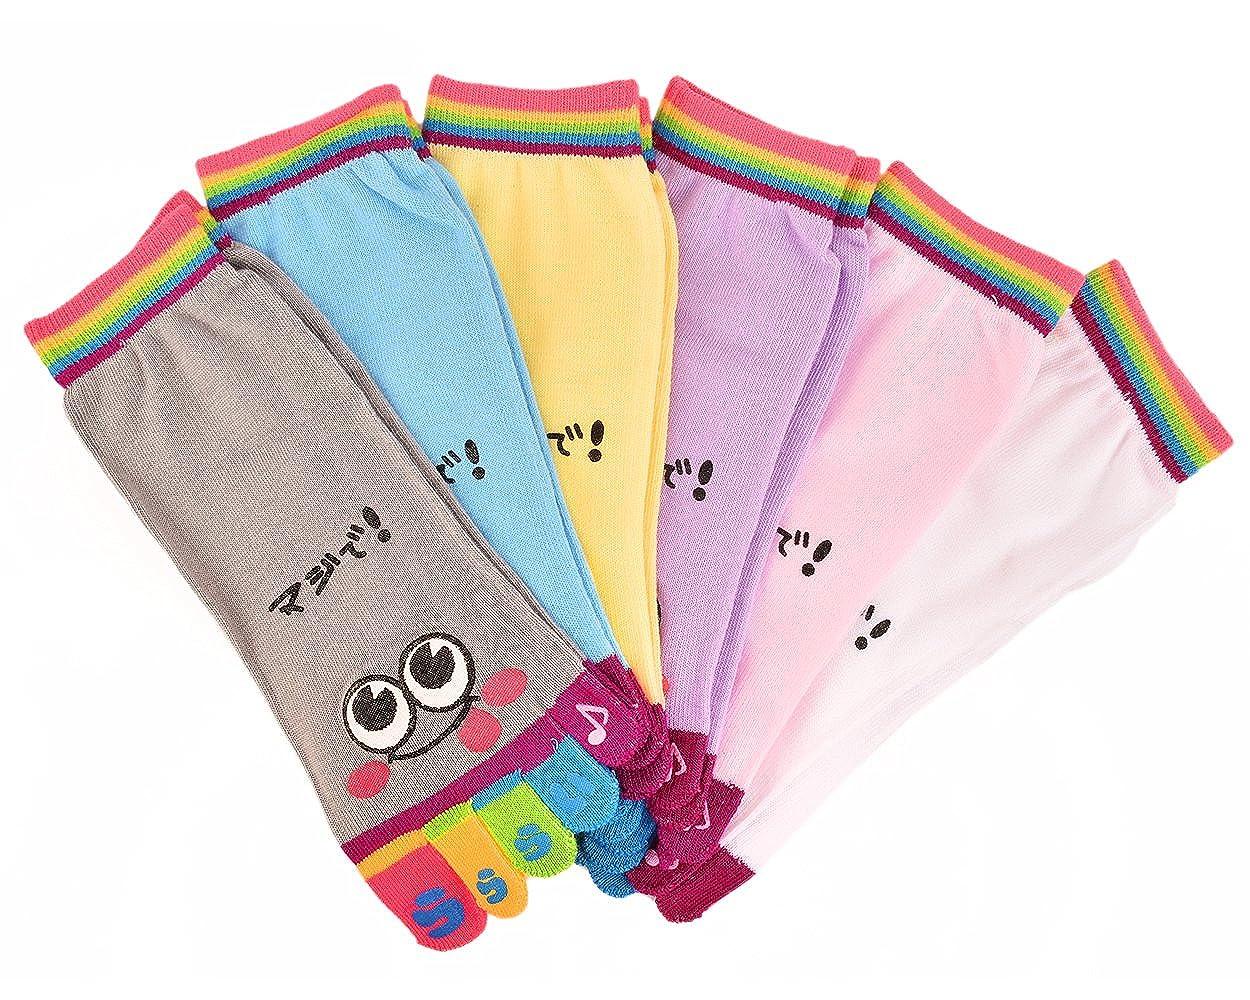 Shopready Toe Socks 6 Pairs of Cartoon Five Fingers Socks Yoga Socks for Women Girls